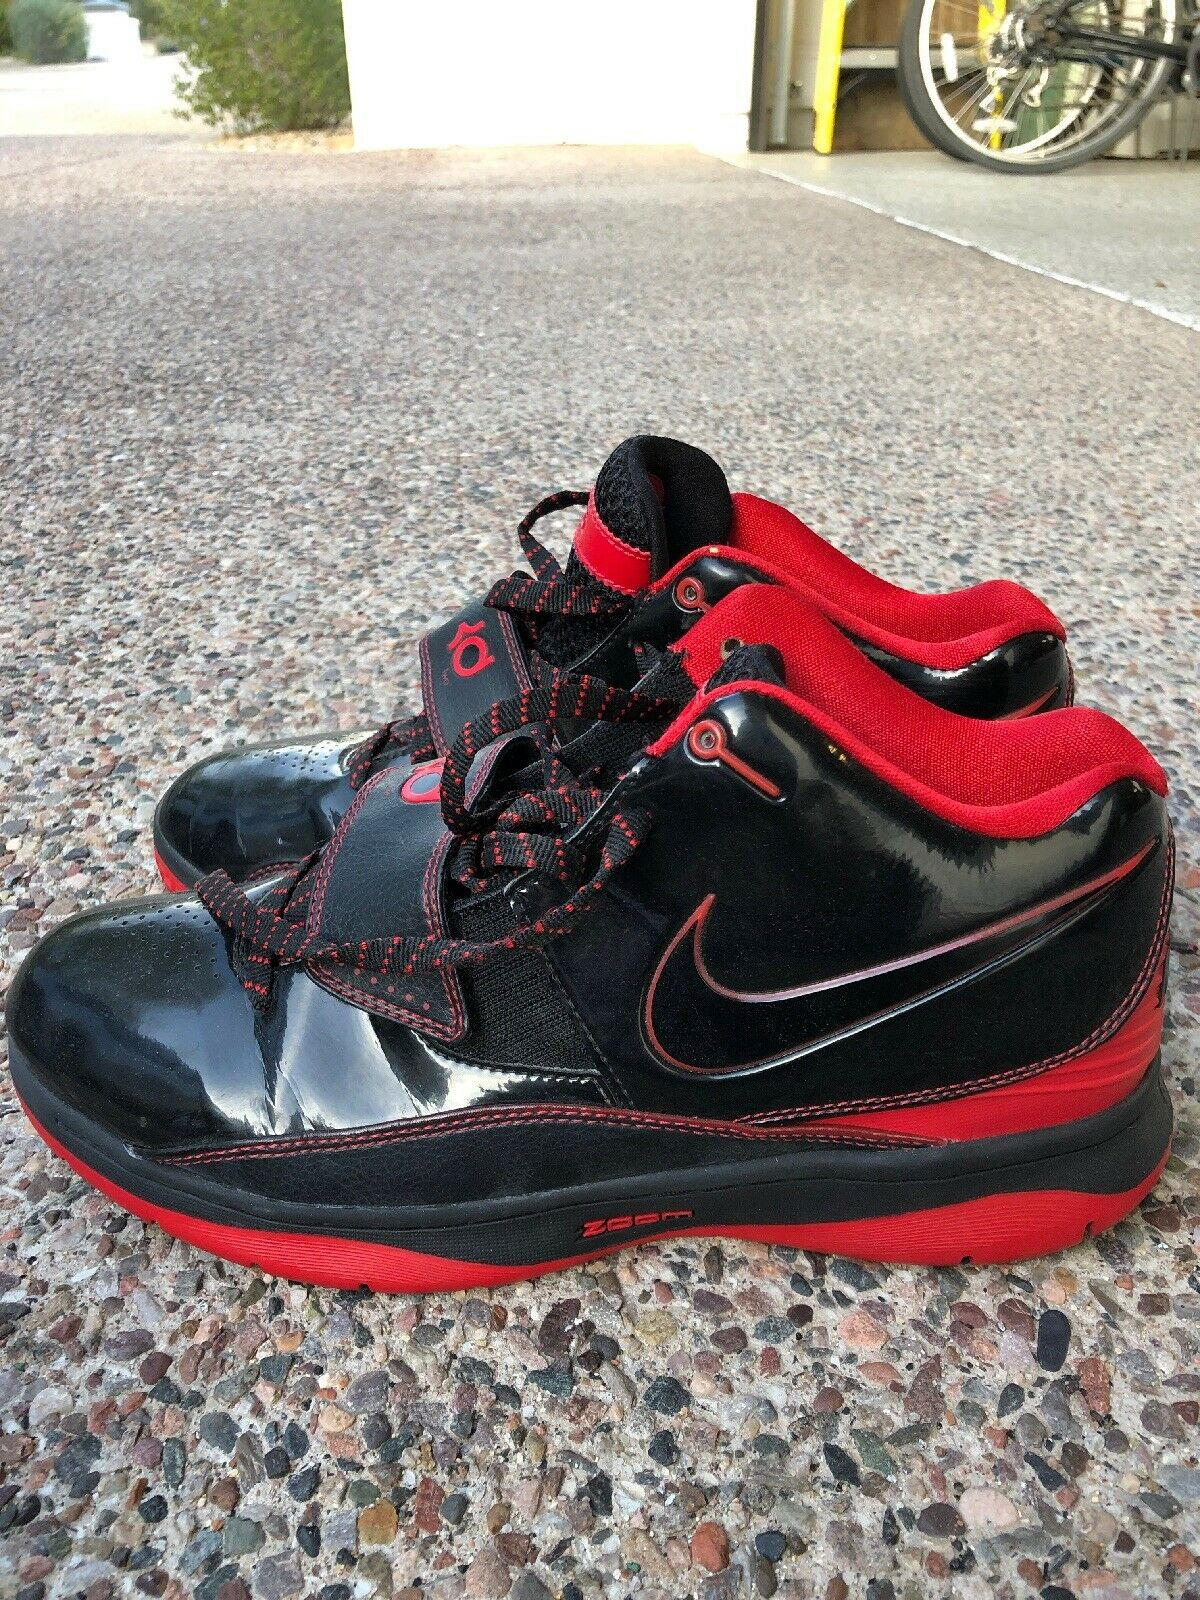 Nike Zoom KD 2 II Black Varsity Red Mens Size 10.5  2010 Kevin Durant 386423-001